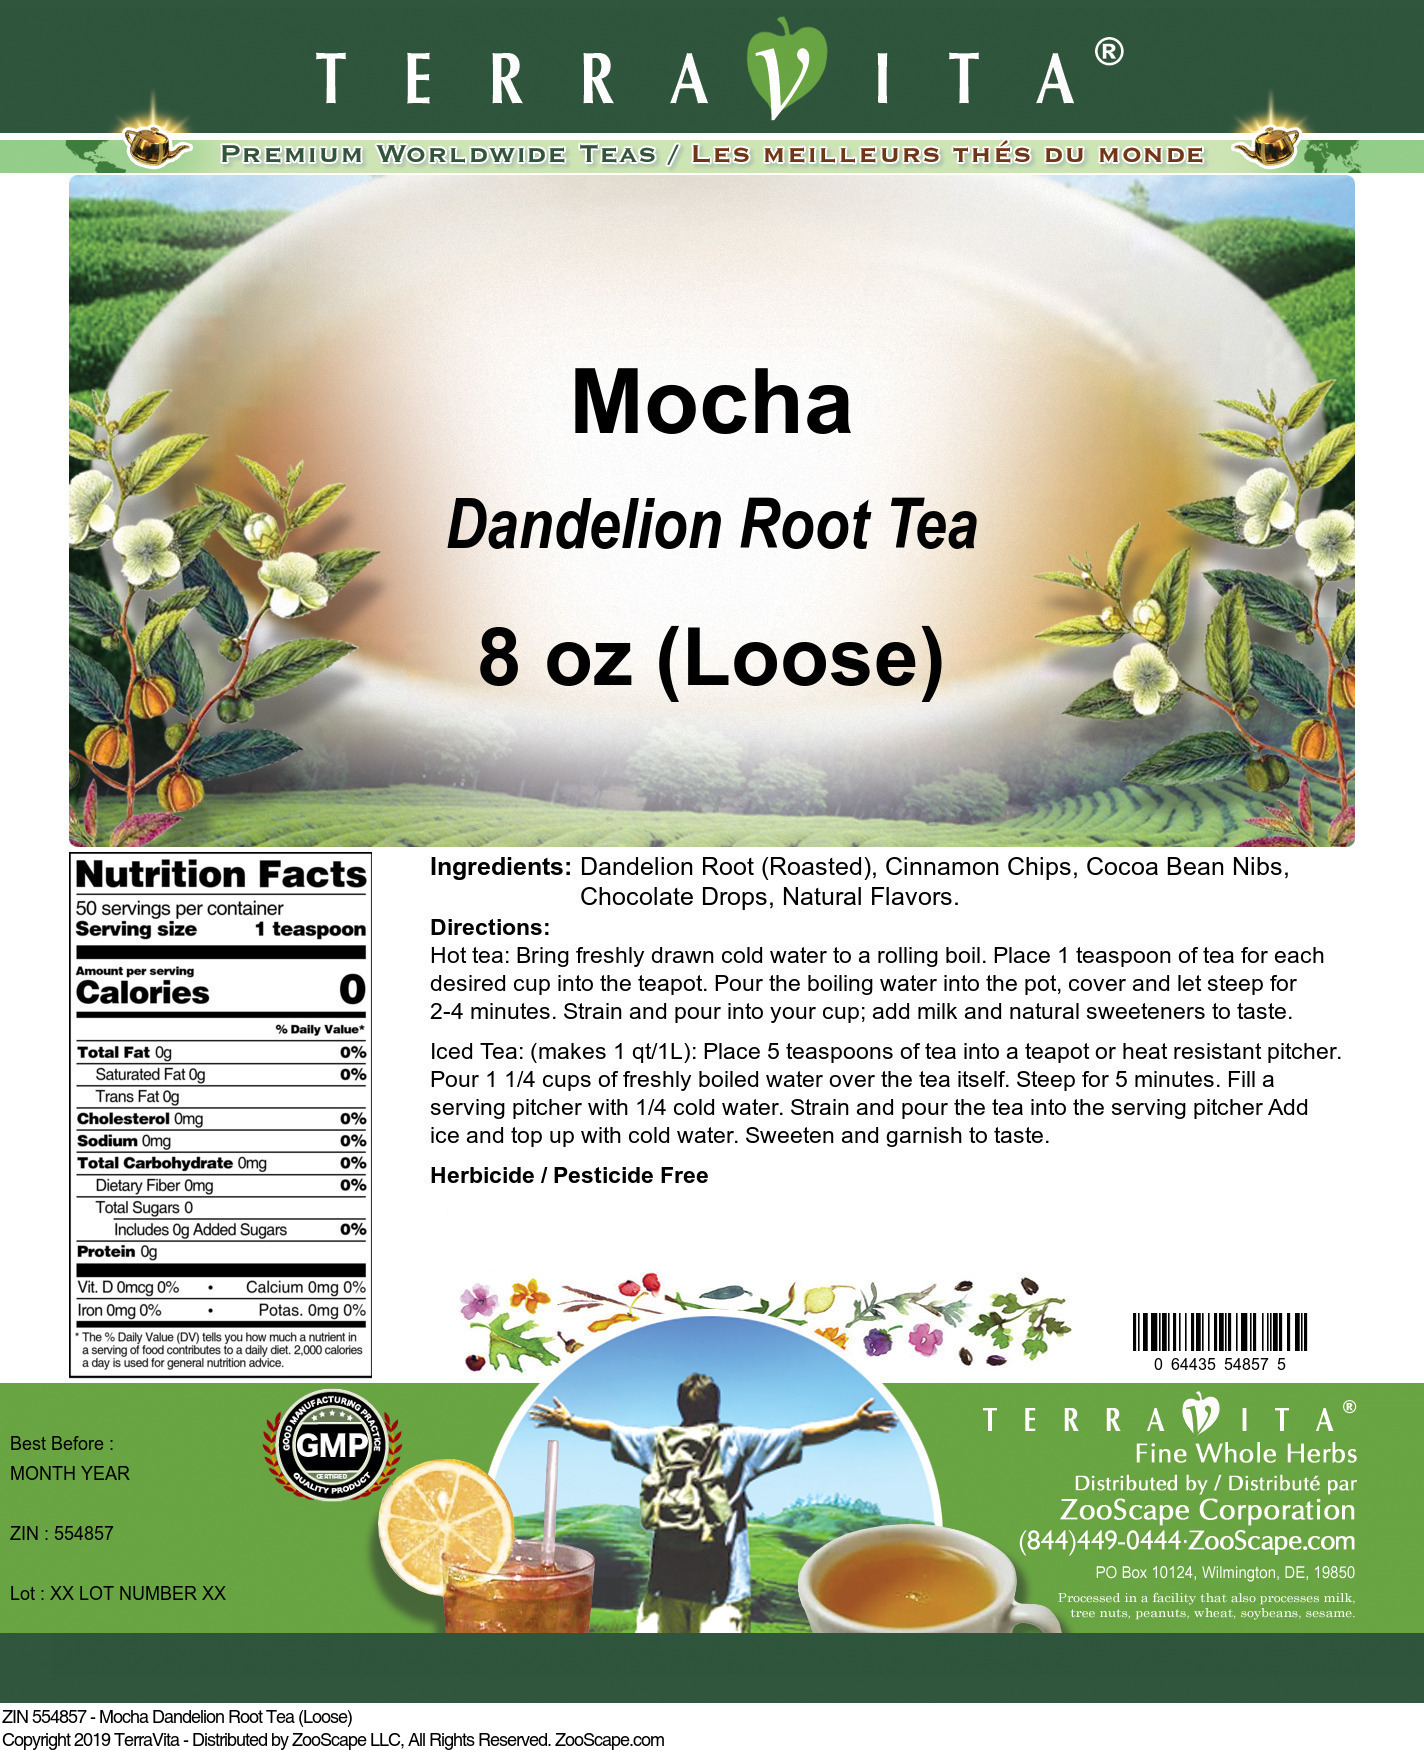 Mocha Dandelion Root